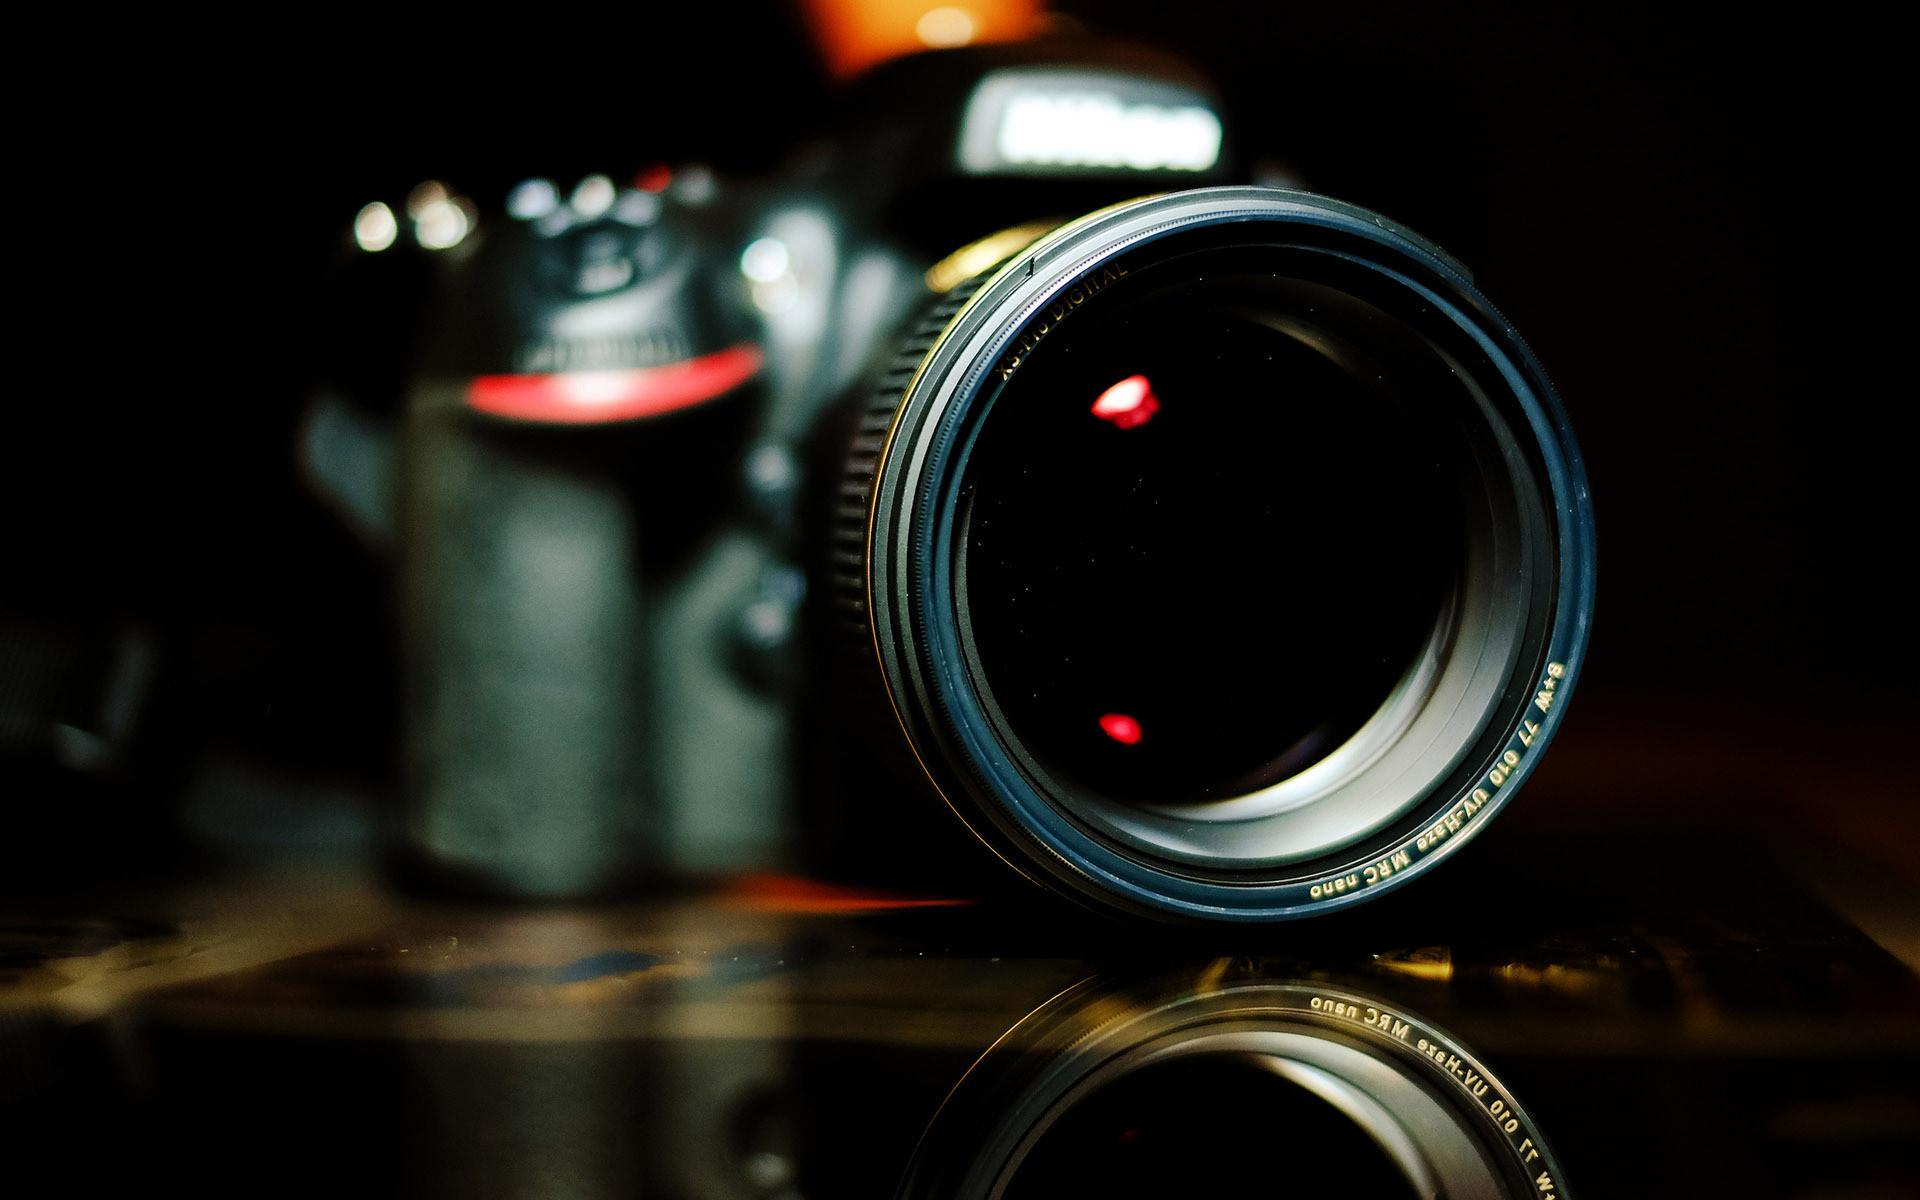 Photography Camera Wallpaper Free Desktop